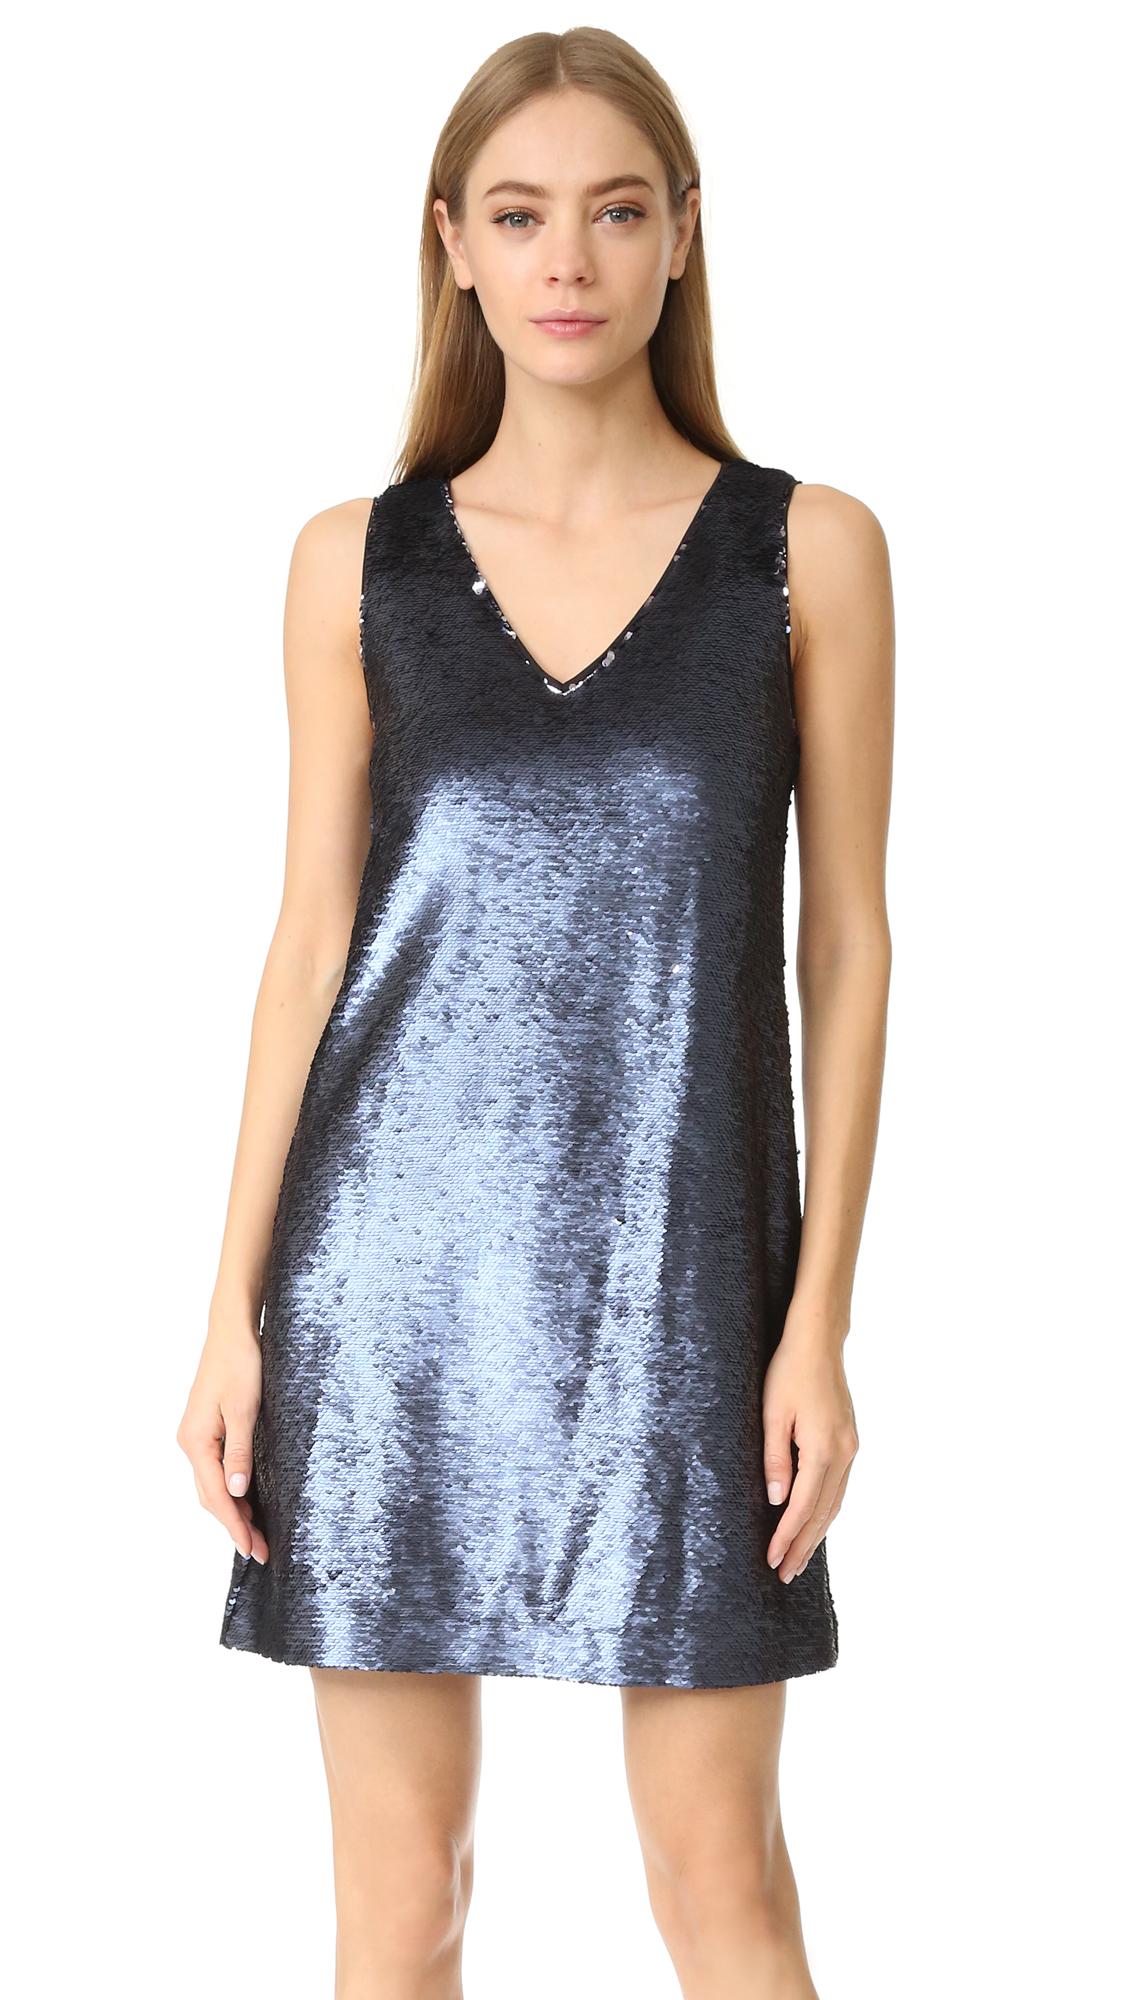 Rebecca Minkoff Claire Sequin Dress - Navy/Silver